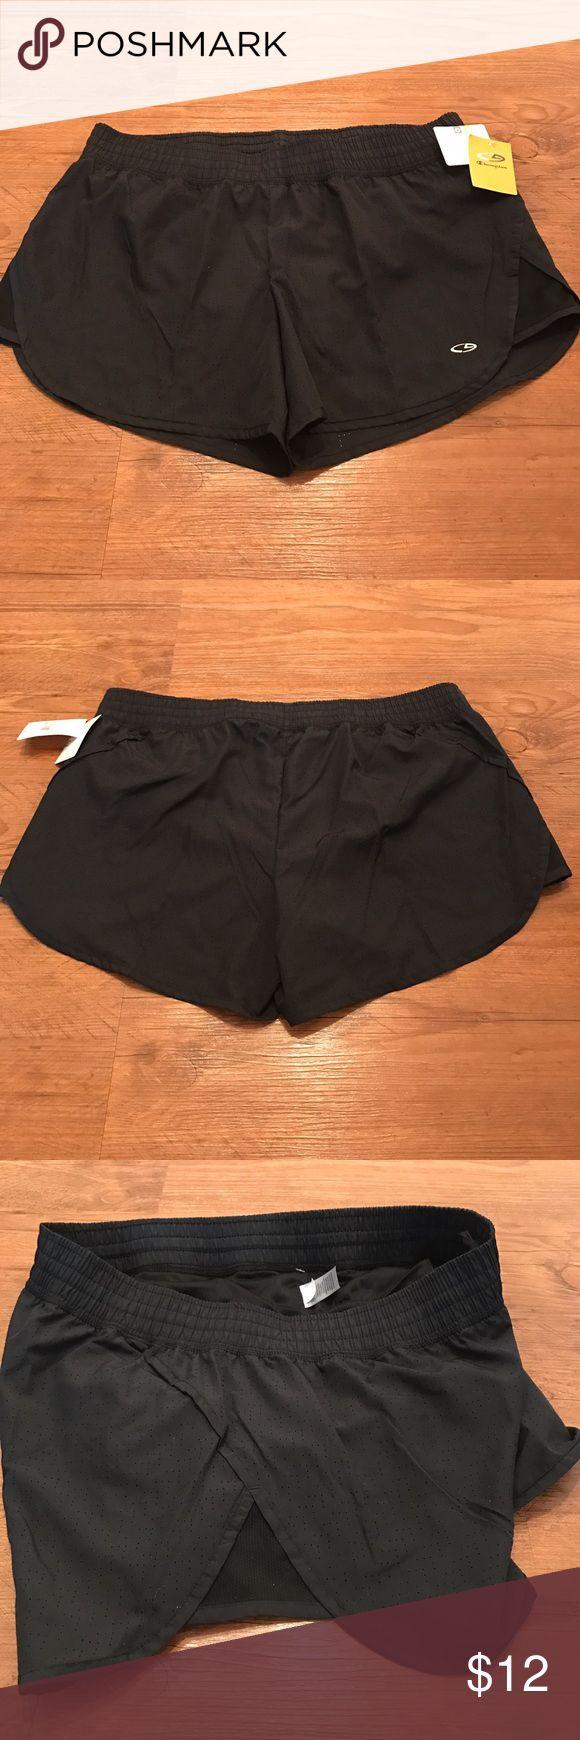 "Champion Duo Dry Black Running Shorts Size L Champion Duo Dry black running shorts NEW With Tags, 17"" across waist, 13"" Rise Champion Shorts"